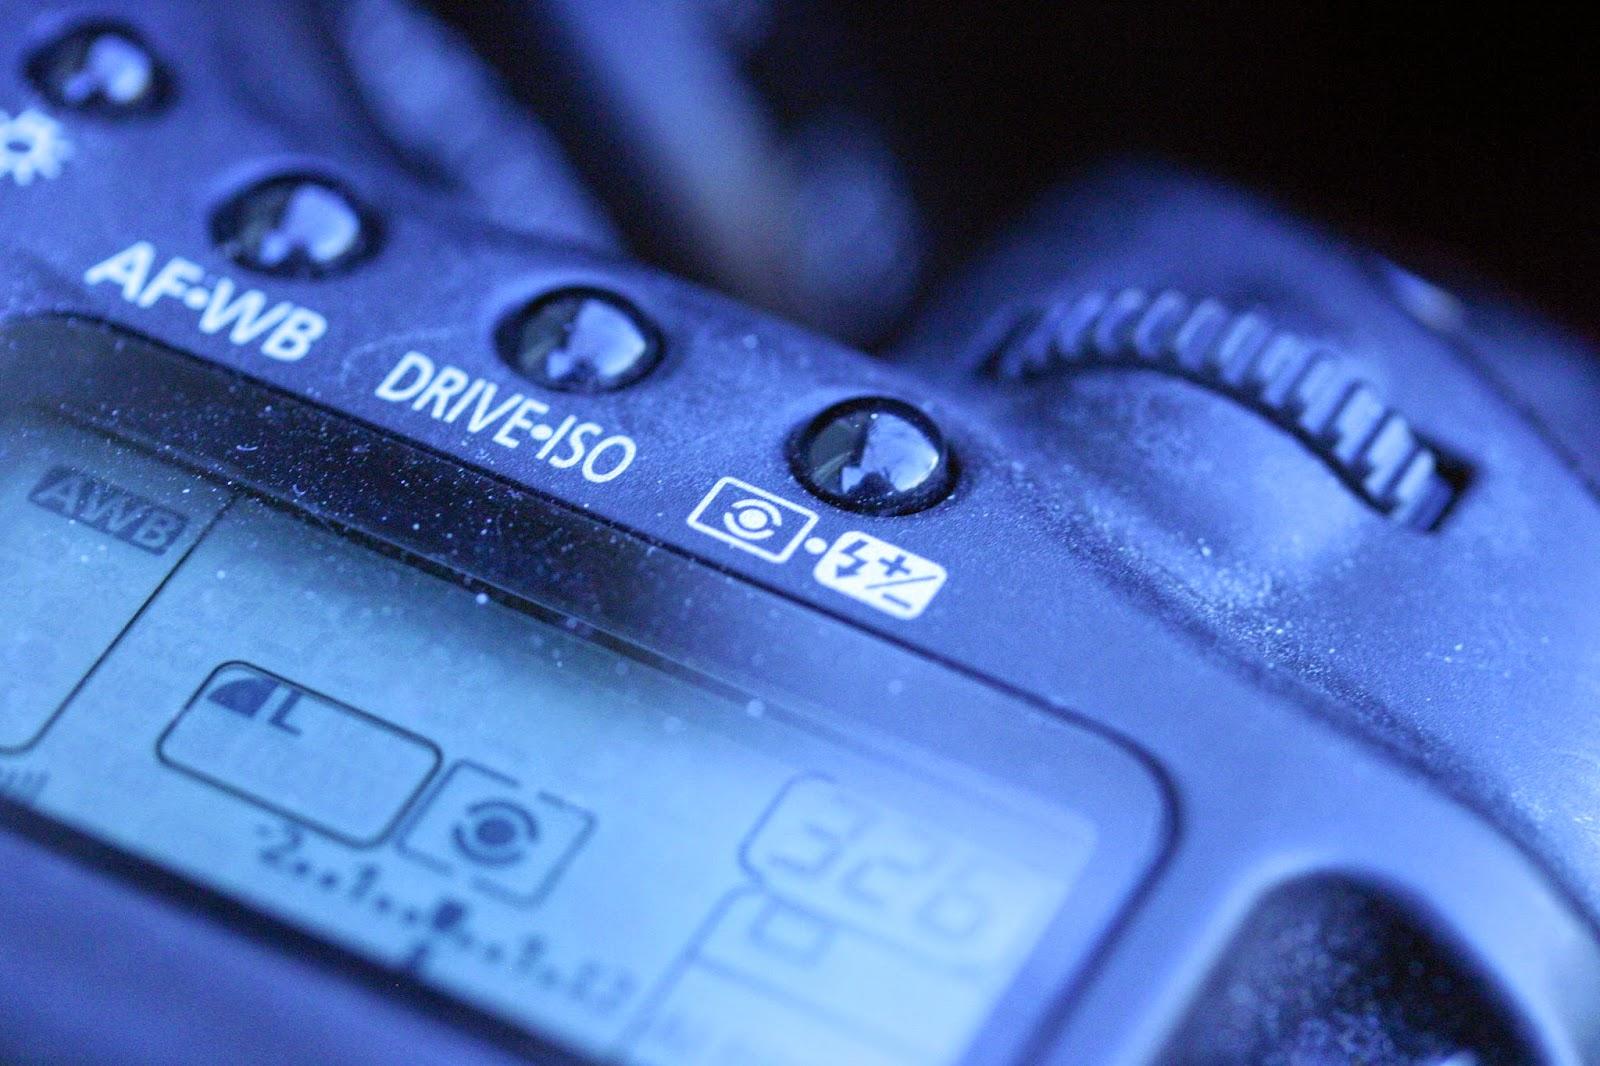 canon 20d controls